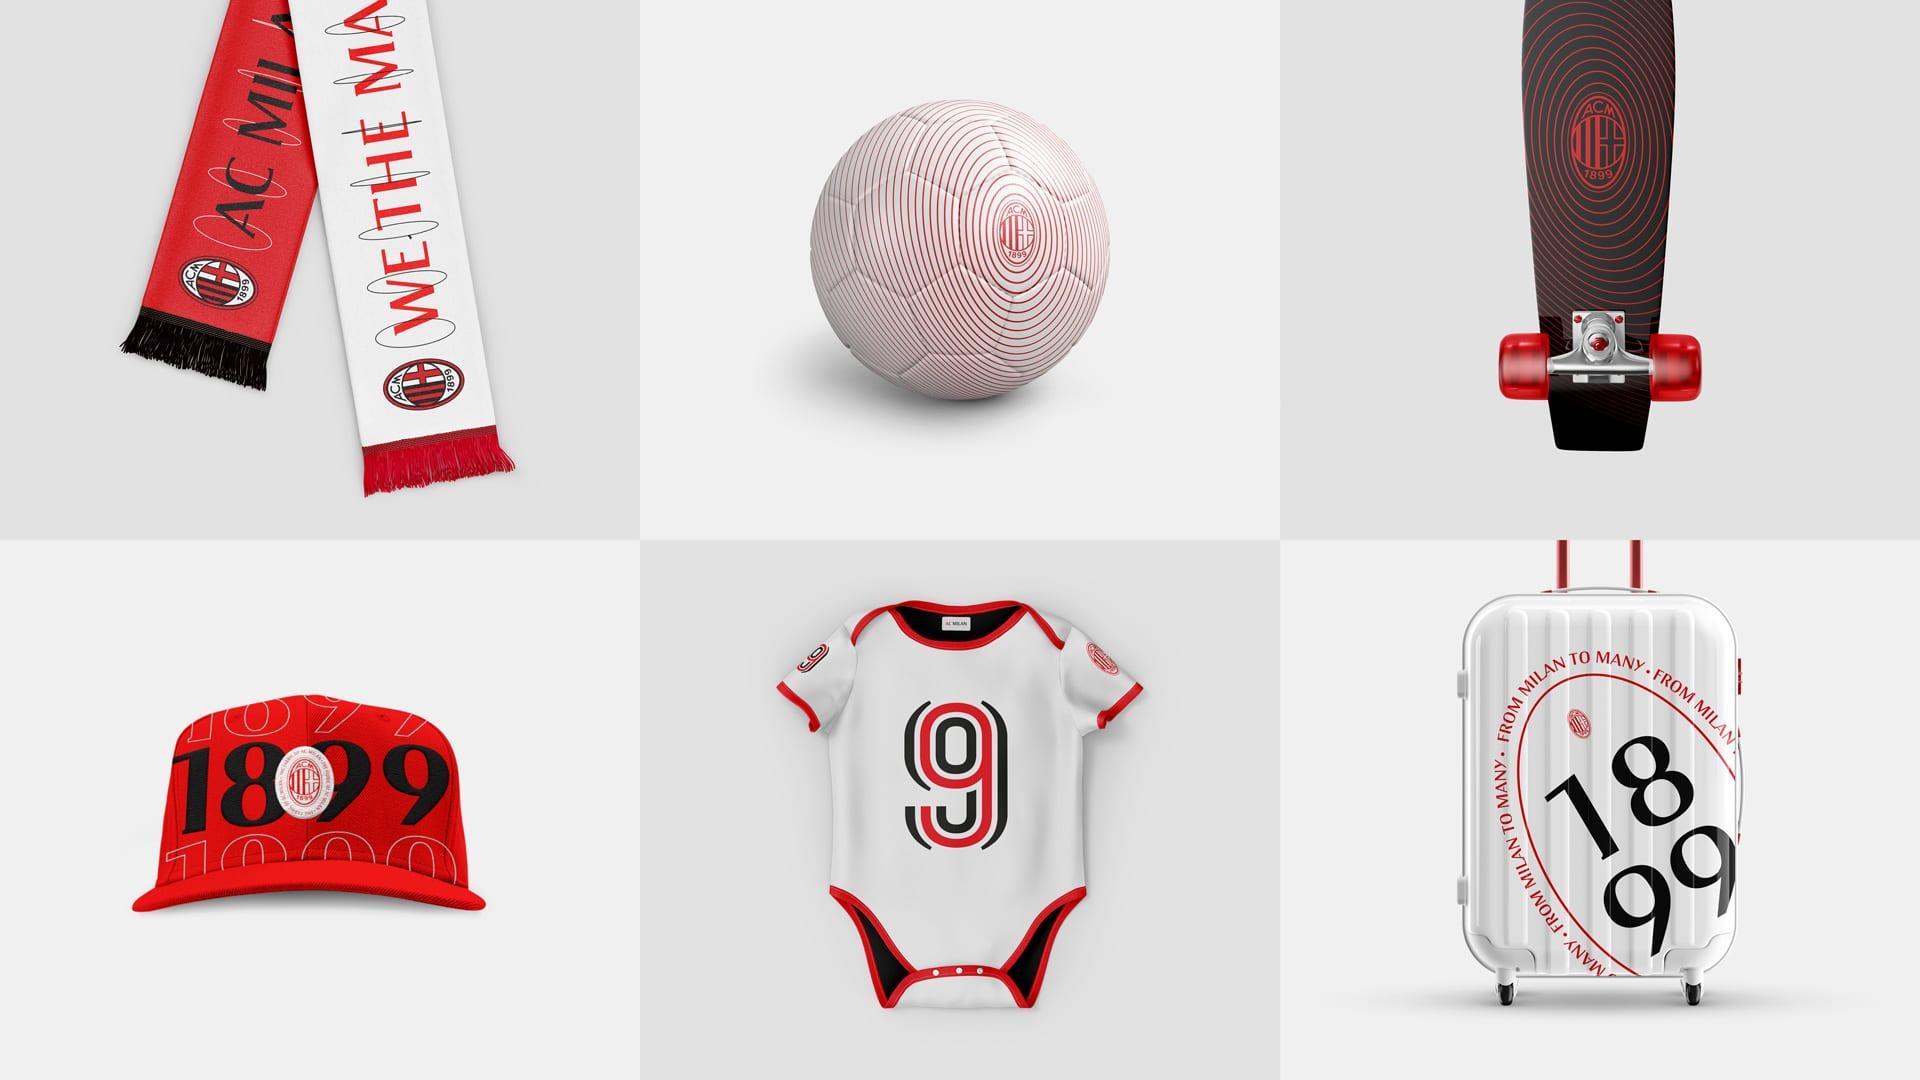 ac milan s novym logom aj custom fontom acbody5 - AC Milan s novým logom aj custom fontom